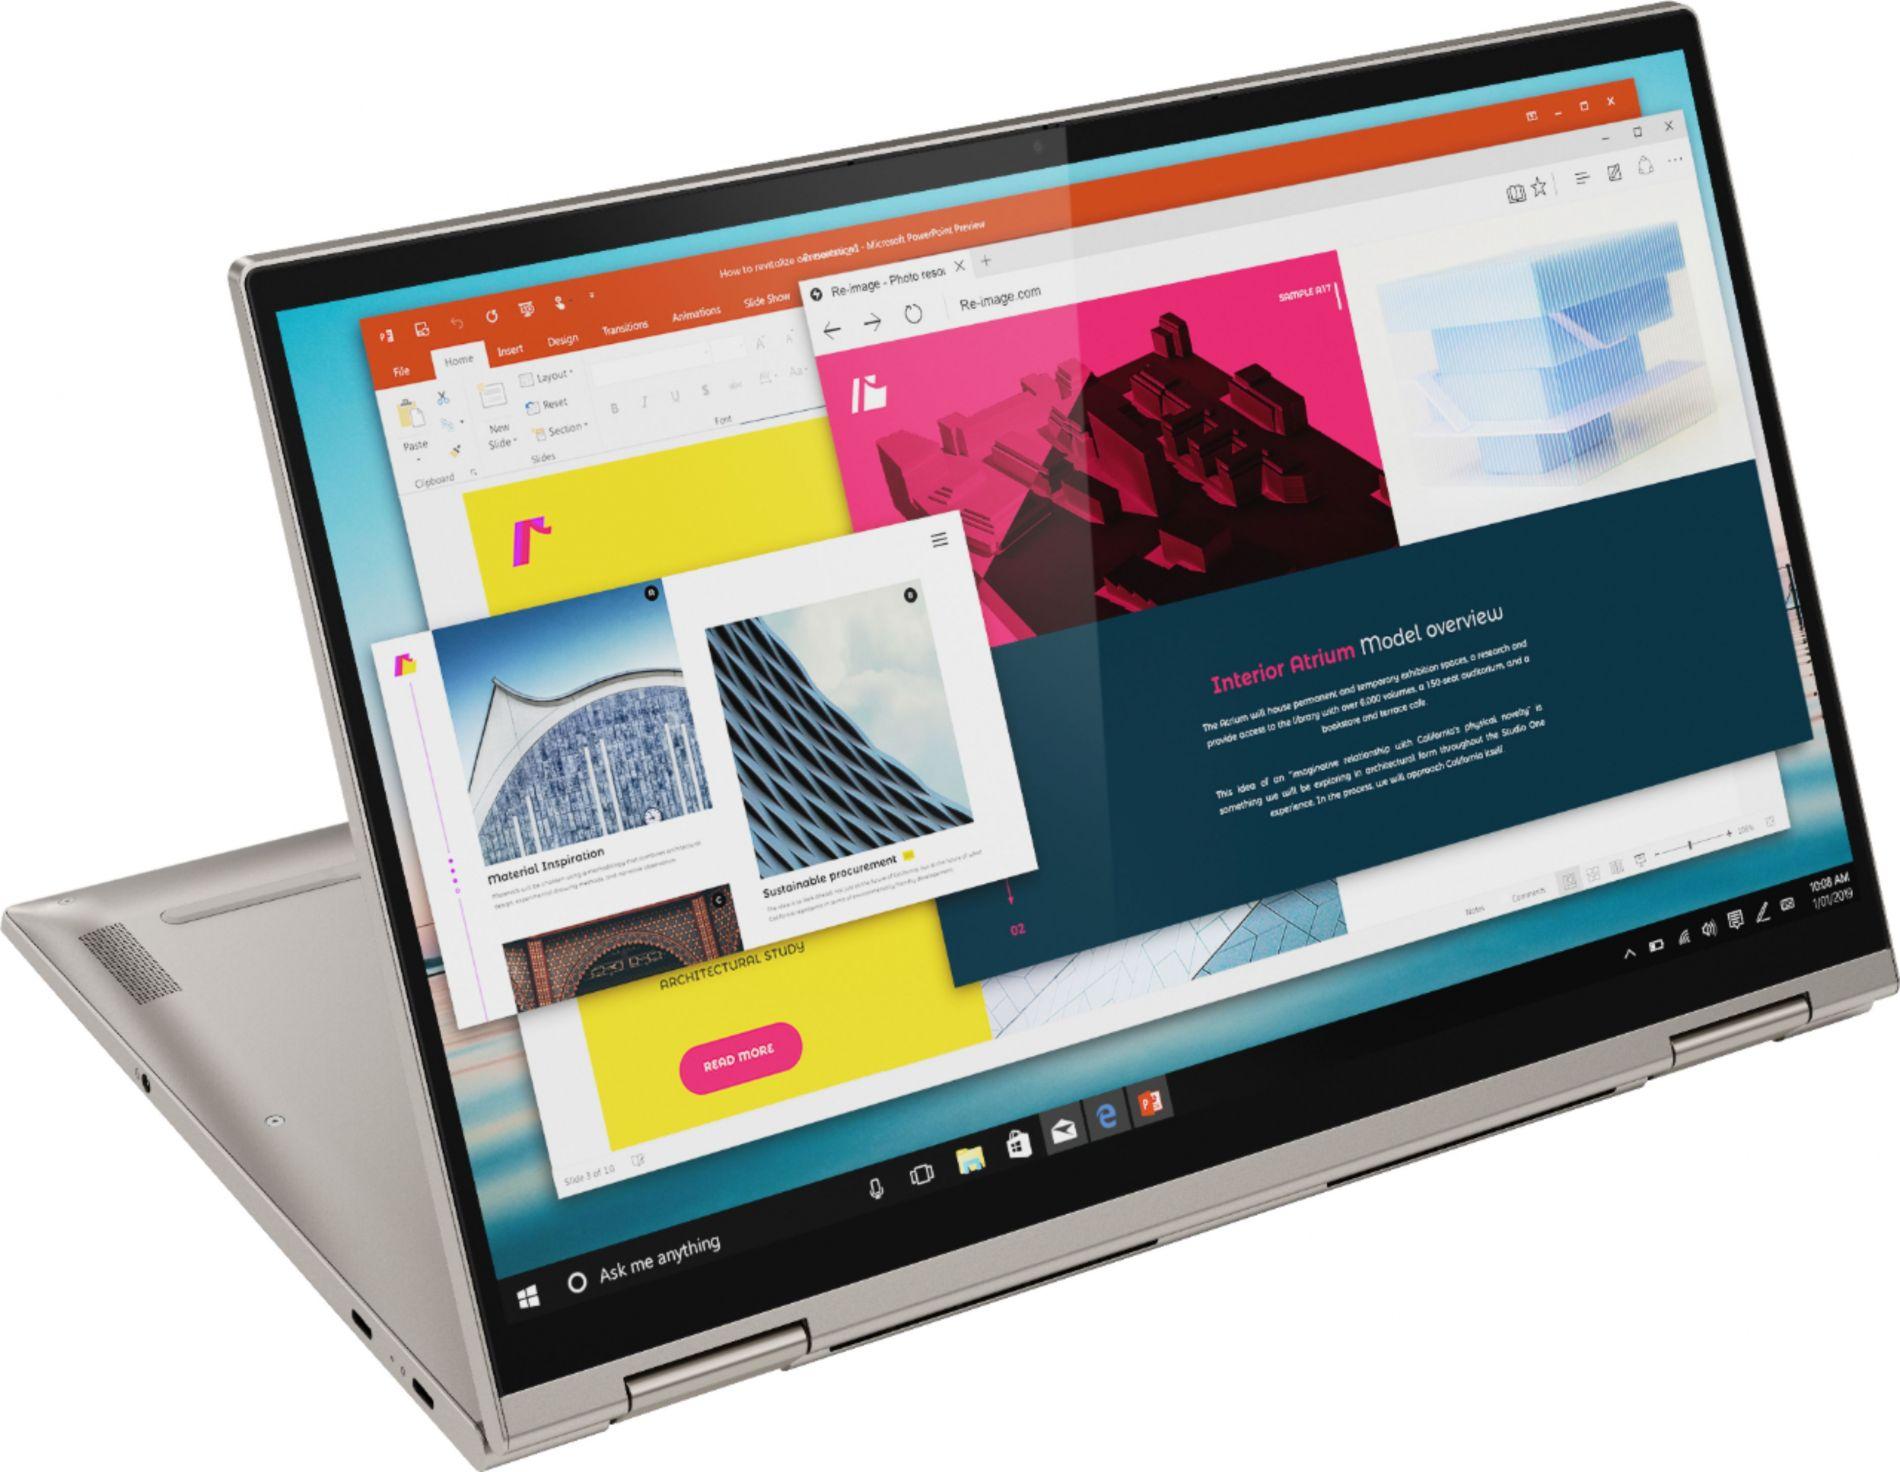 laptop-lenovo-yoga-c740-141ml-convertible-pantalla-14-intel-core-i5-10ma-gen-ram-8gb-d-solido-256gb-touch-screen-windows-10